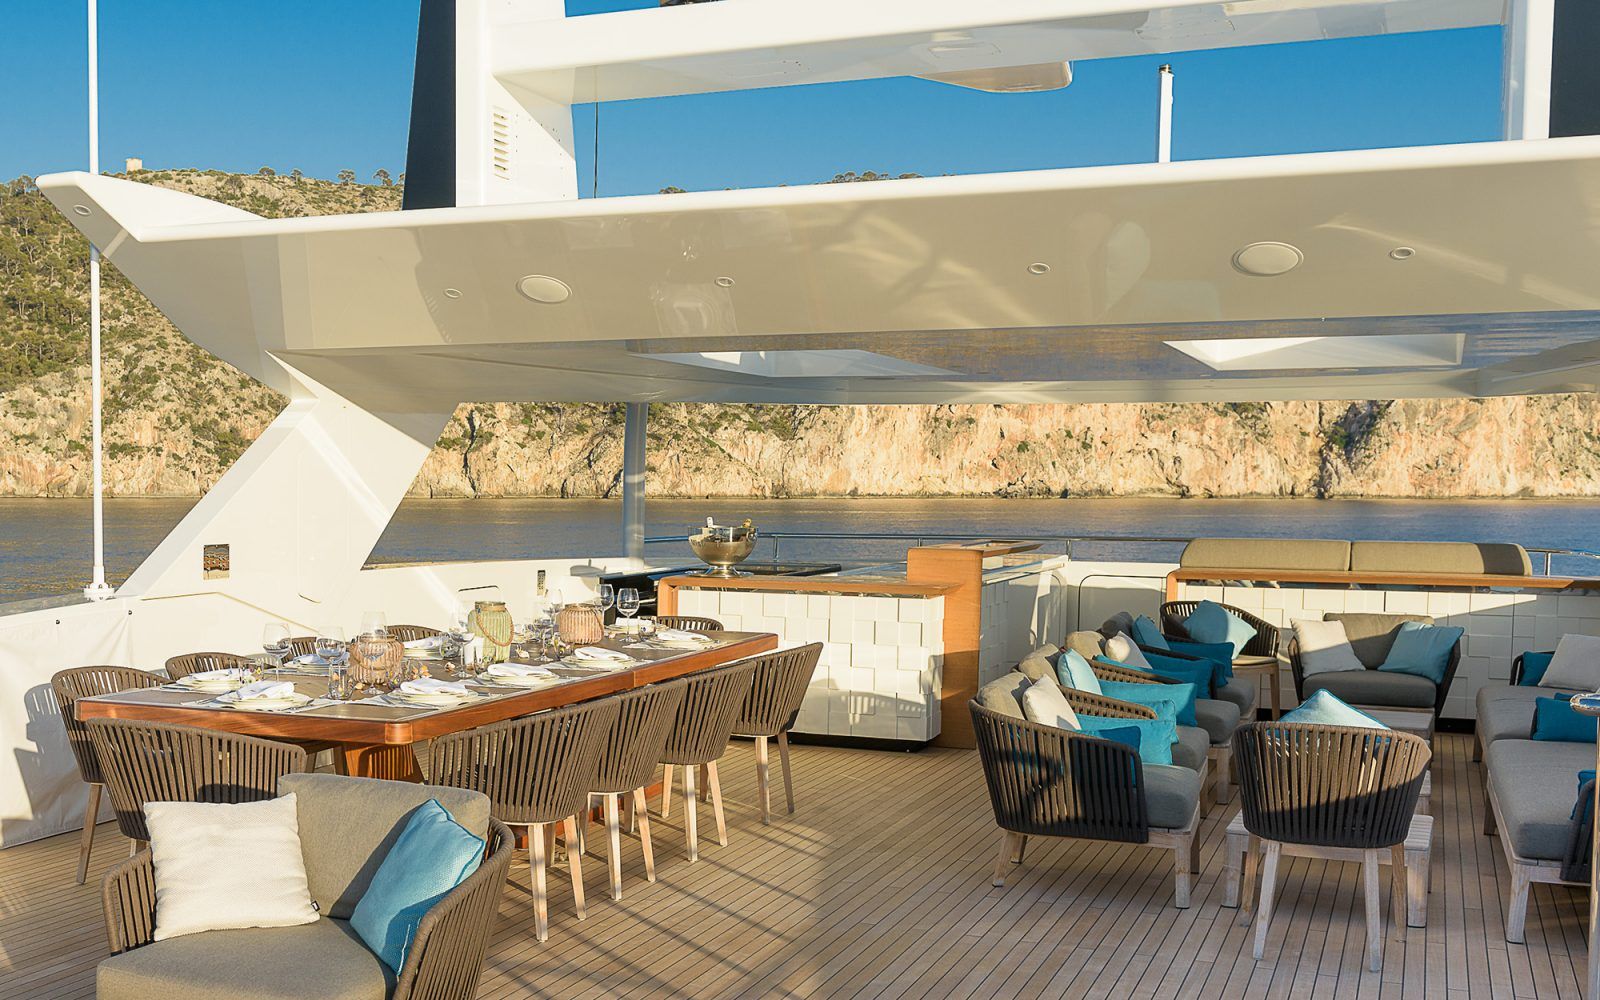 MR. T upper deck dining area | Mr. T